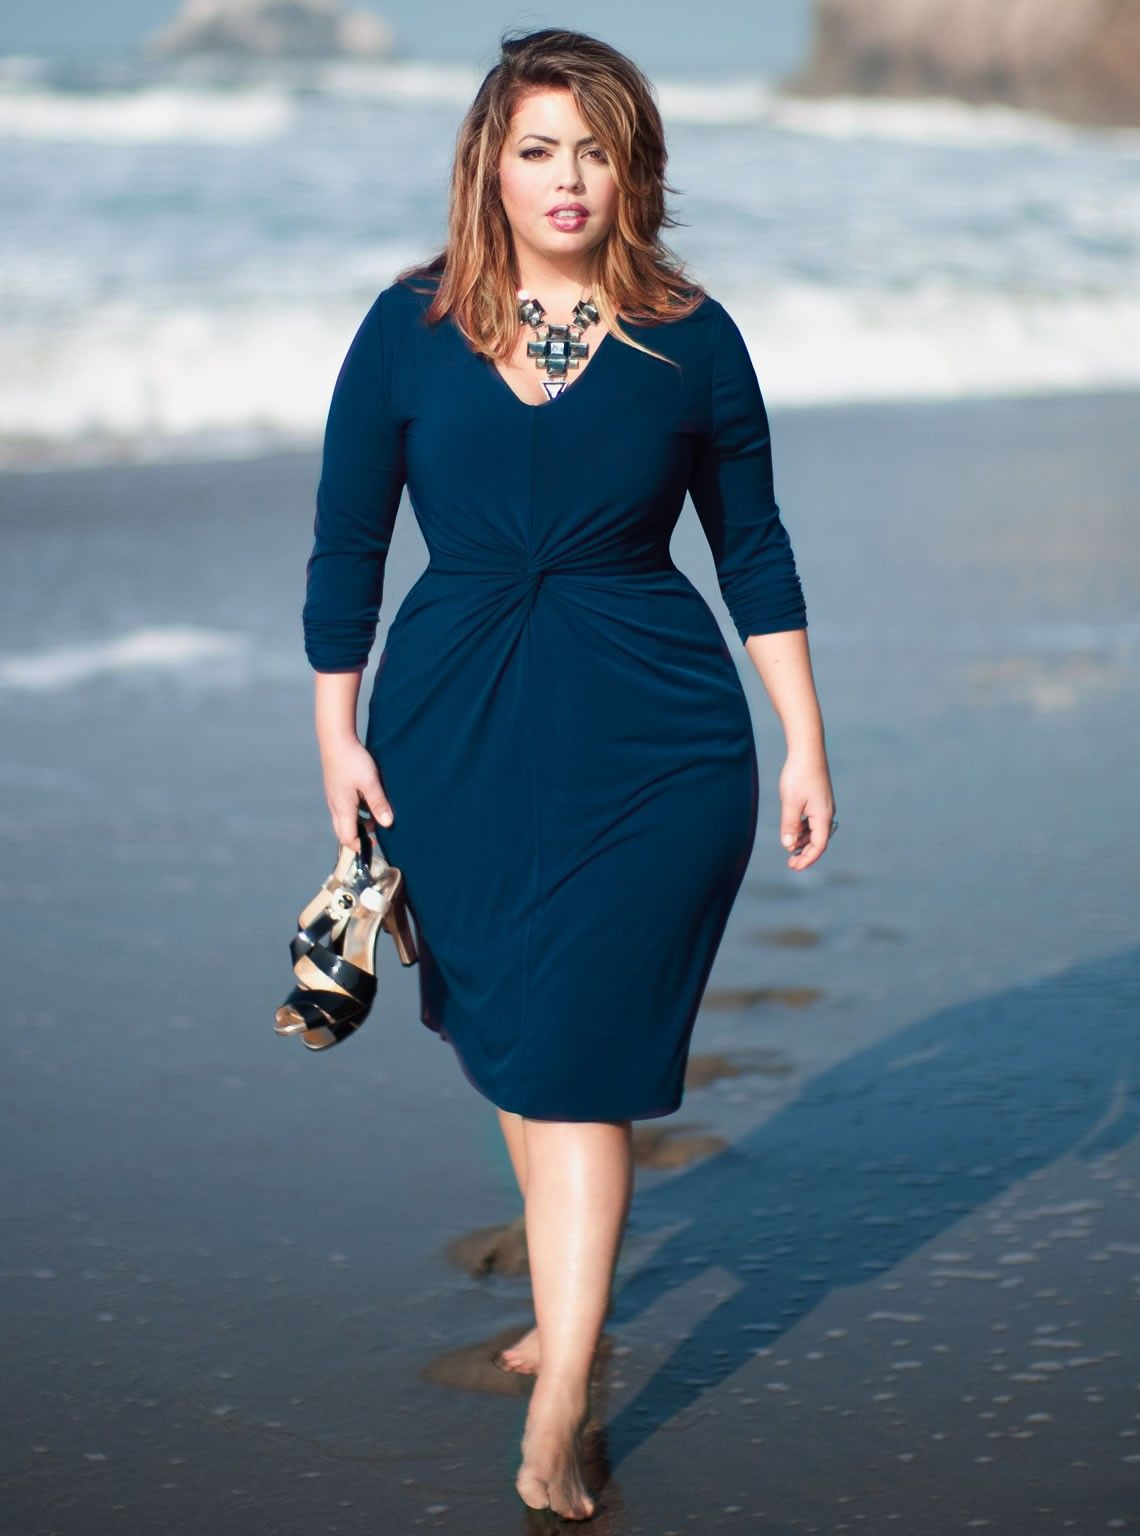 Fluvia Lacerda Fotos Resultados Da Busca Yahoo Search Moda Para Gordinhas Mulheres Gordas Vestidos Baratos